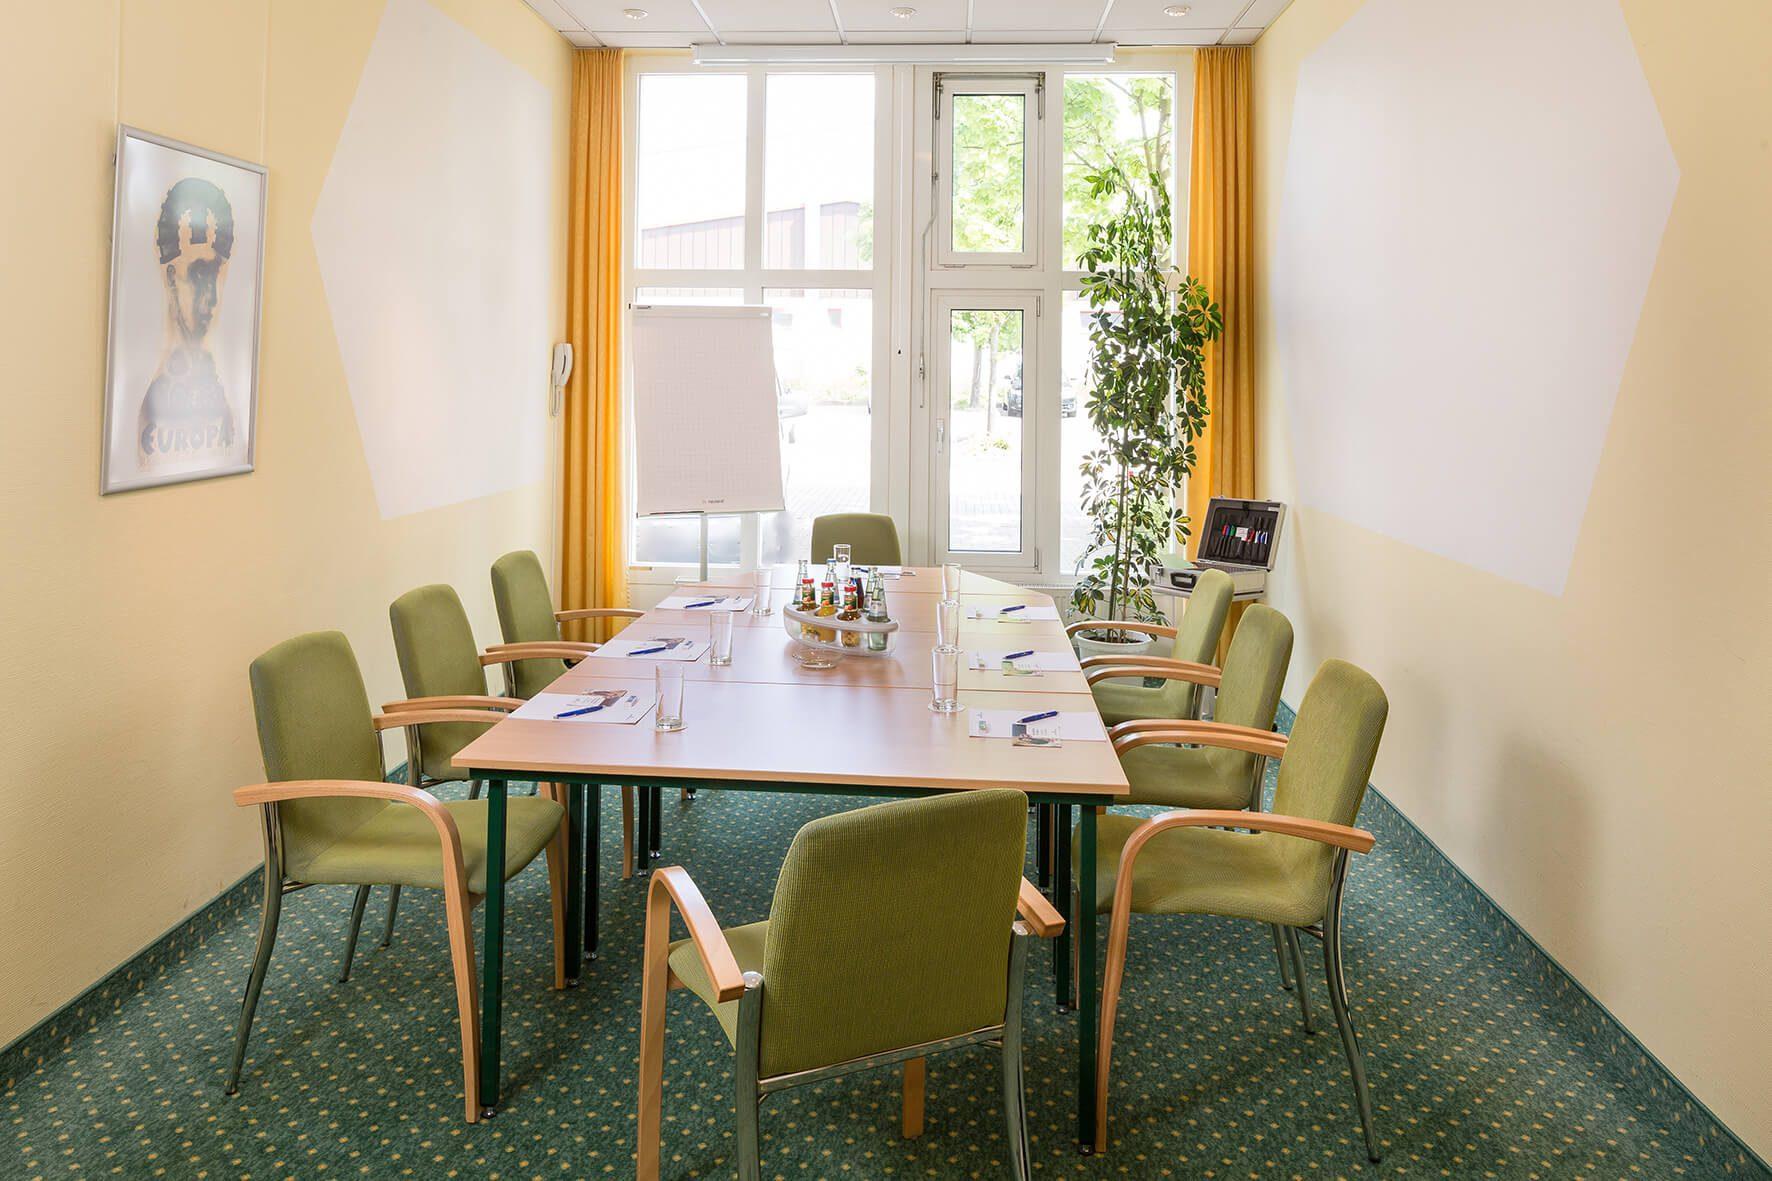 AMBER HOTEL Chemnitz Park: Tagungsraum Limbach